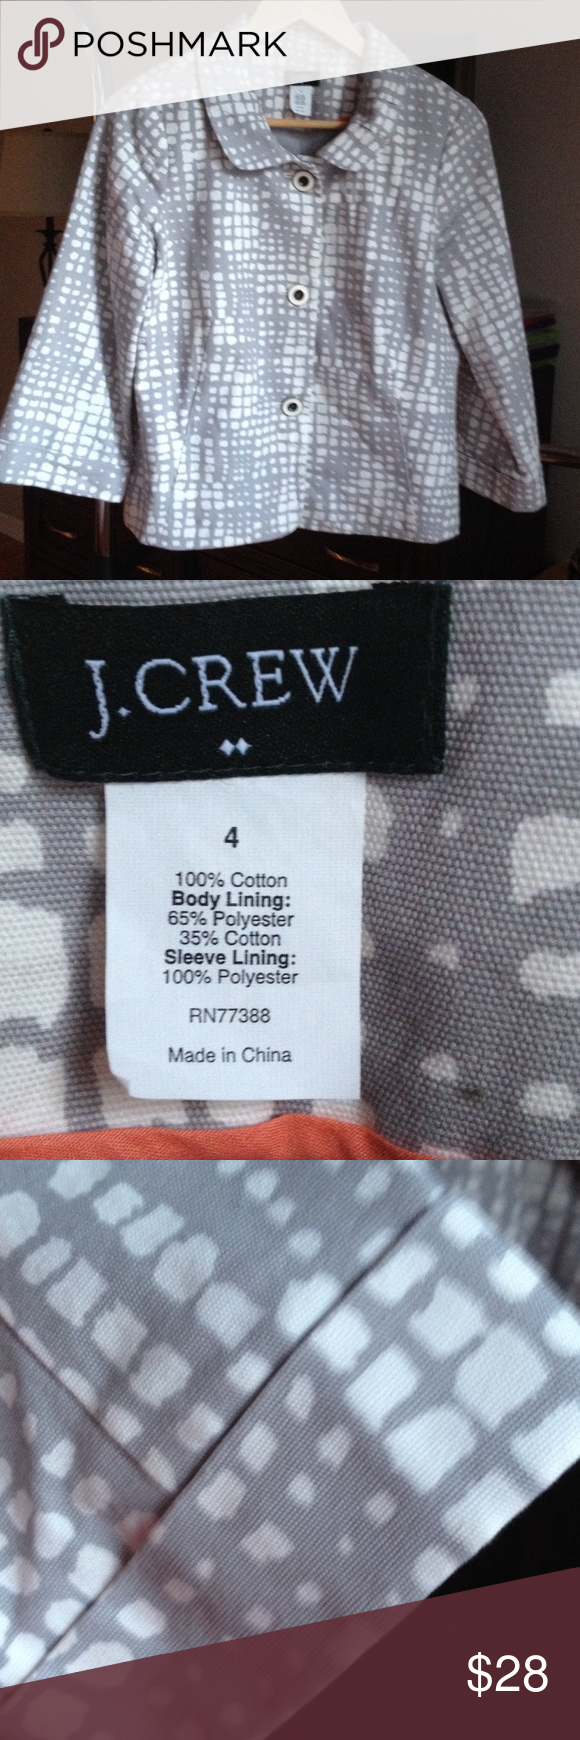 J. Crew Factory Store . Jacket . Size 4 Excellent condition . J. Crew Jackets & Coats